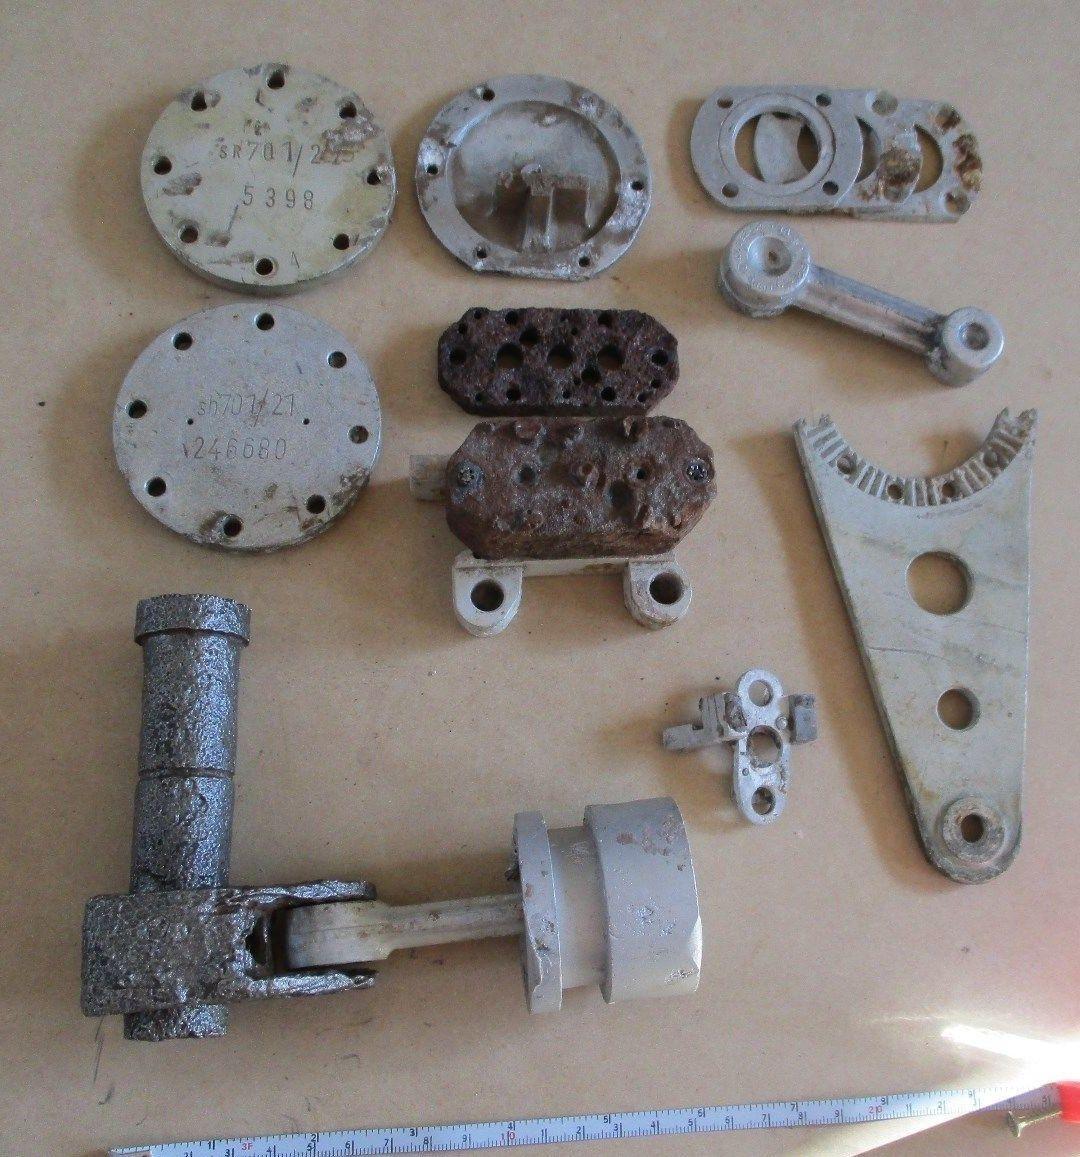 Hydraulic servo relics from Mittelwerk